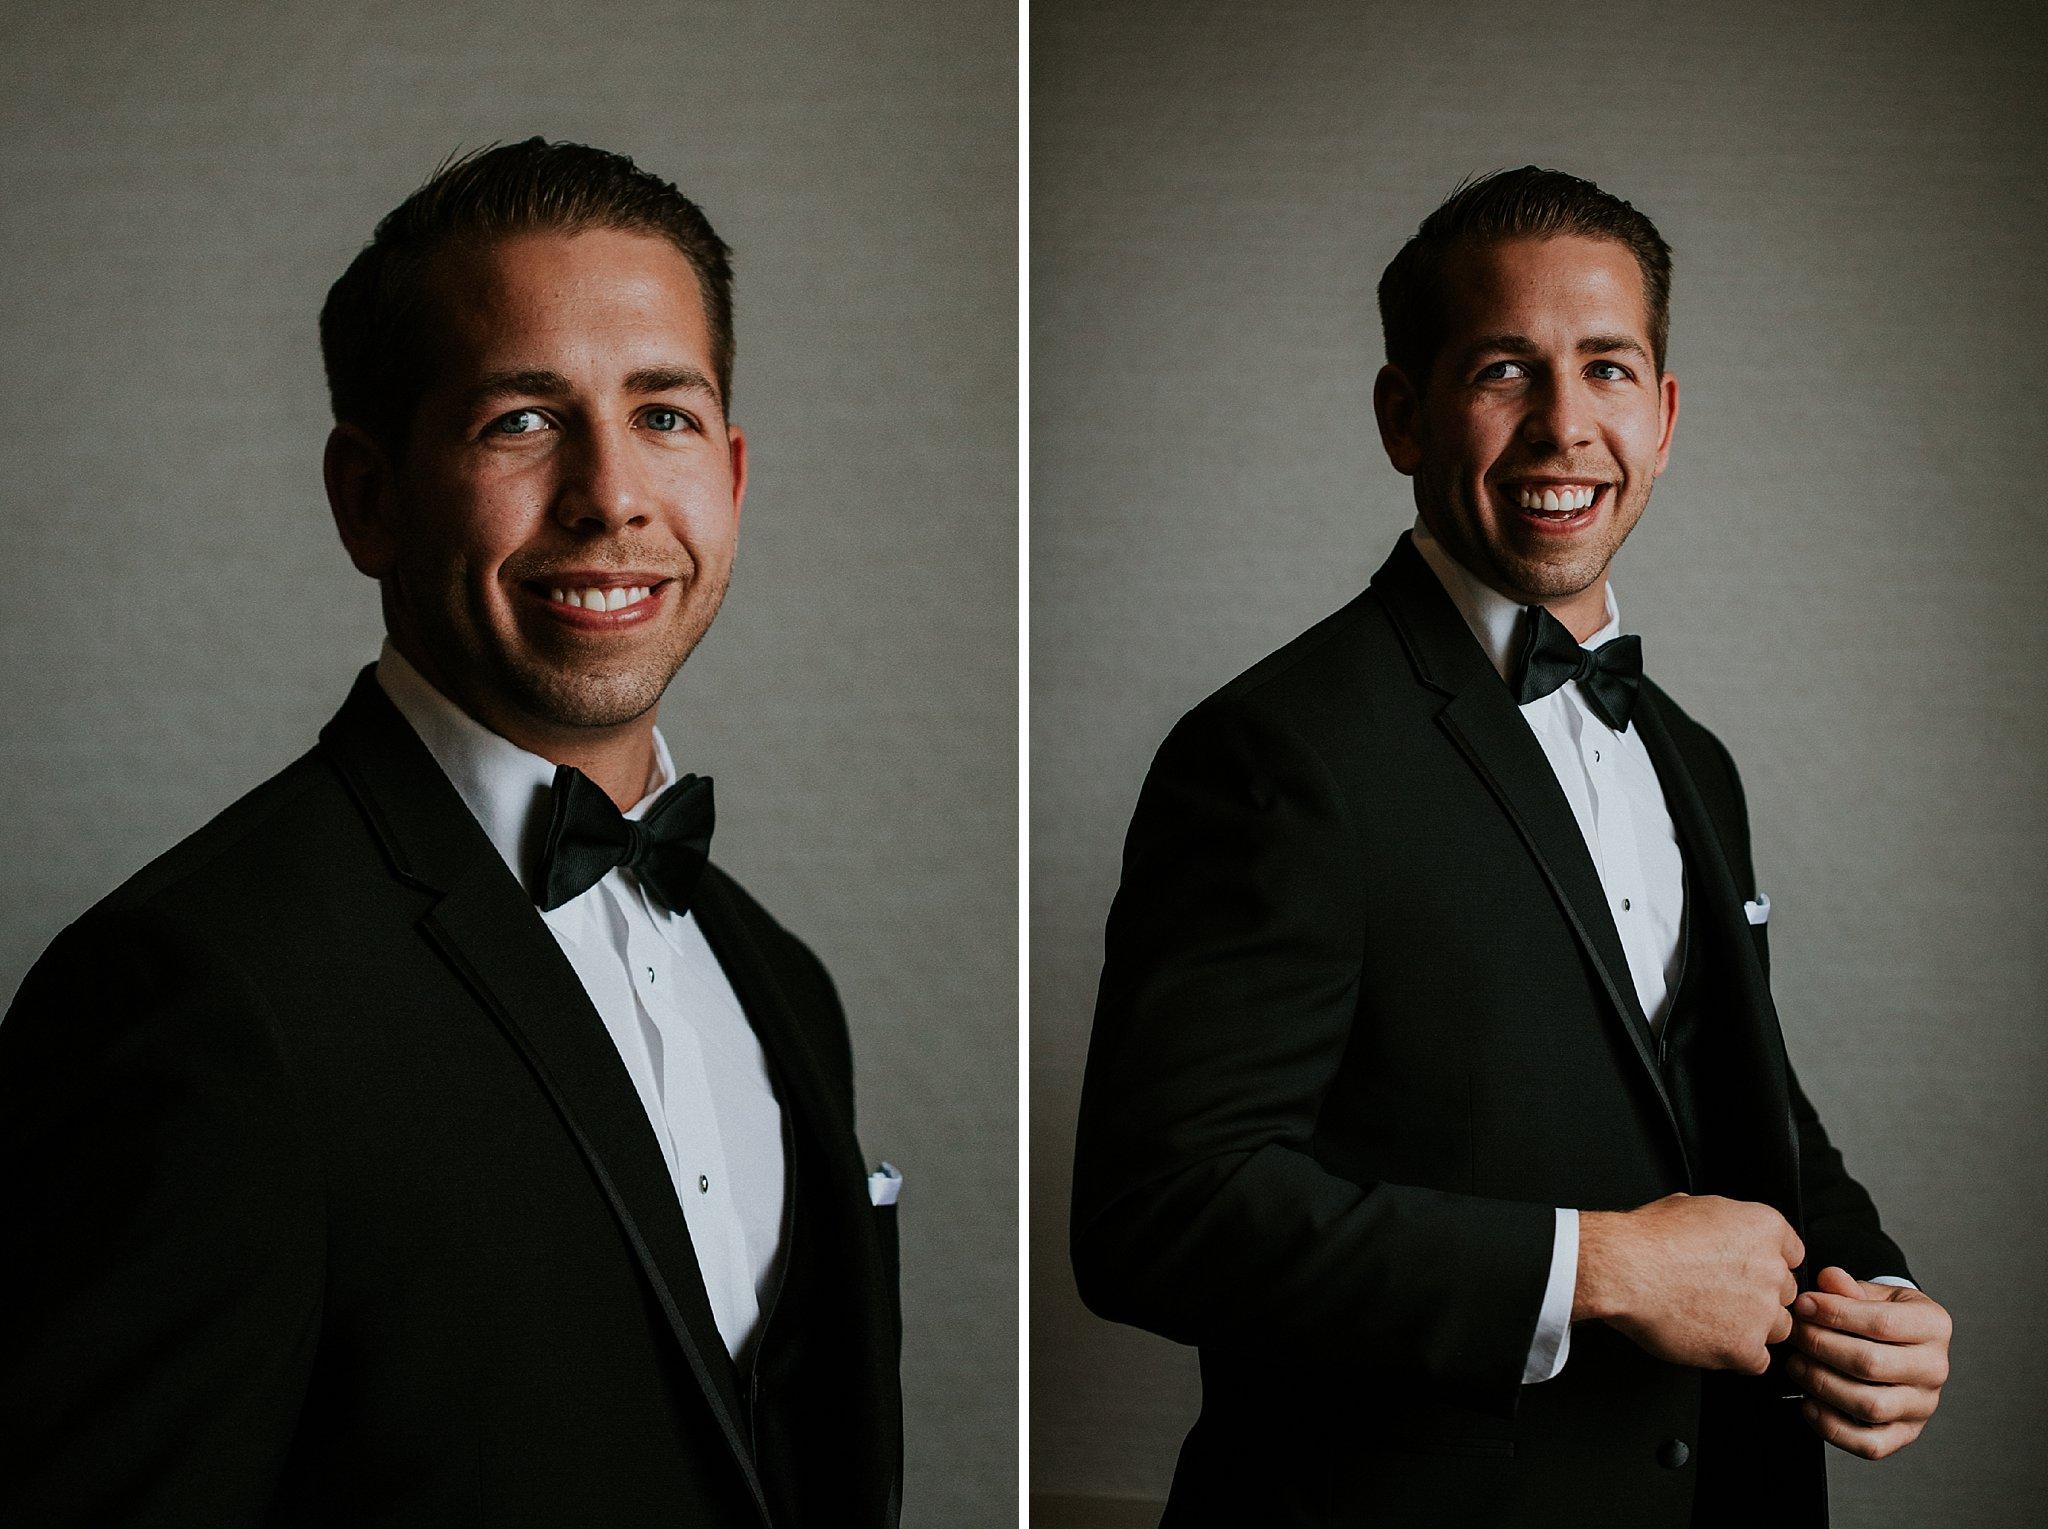 Matt-Lauren_St-Marys_Hilton-City-Center-Milwaukee-Wedding_liller-photo_0009.jpg